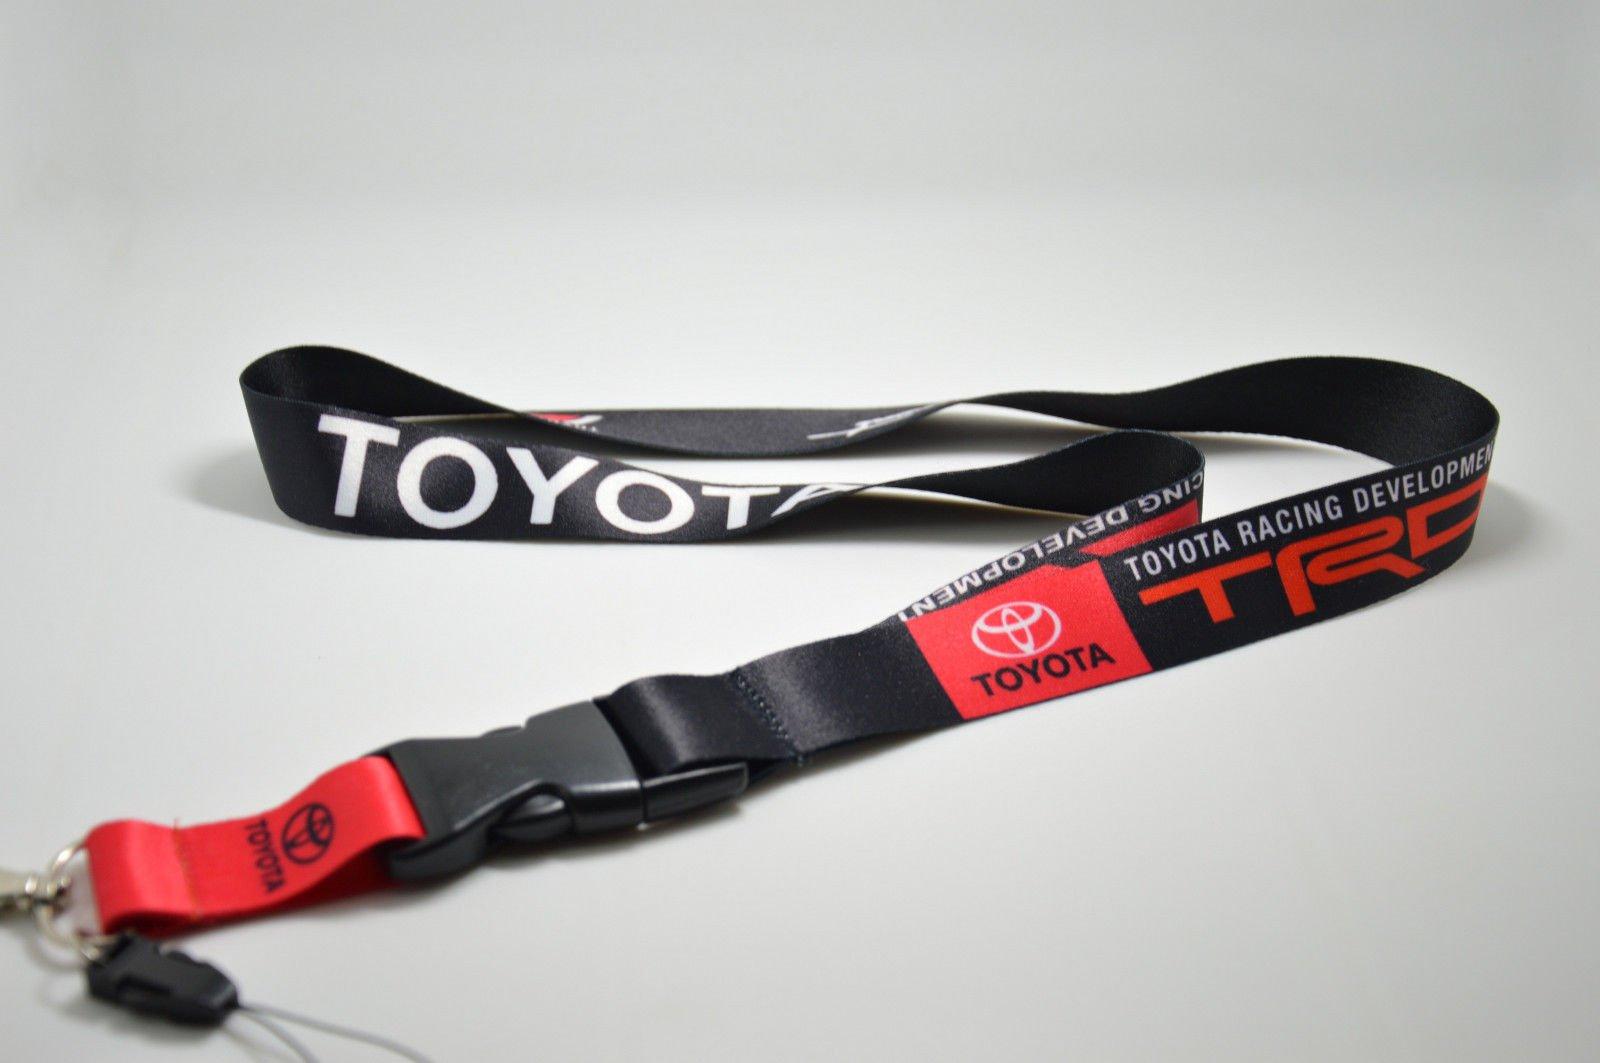 Trd Toyota Racing Jdm Supra Lanyard Lexus Phone Holders Neck Strap Id Key Chain